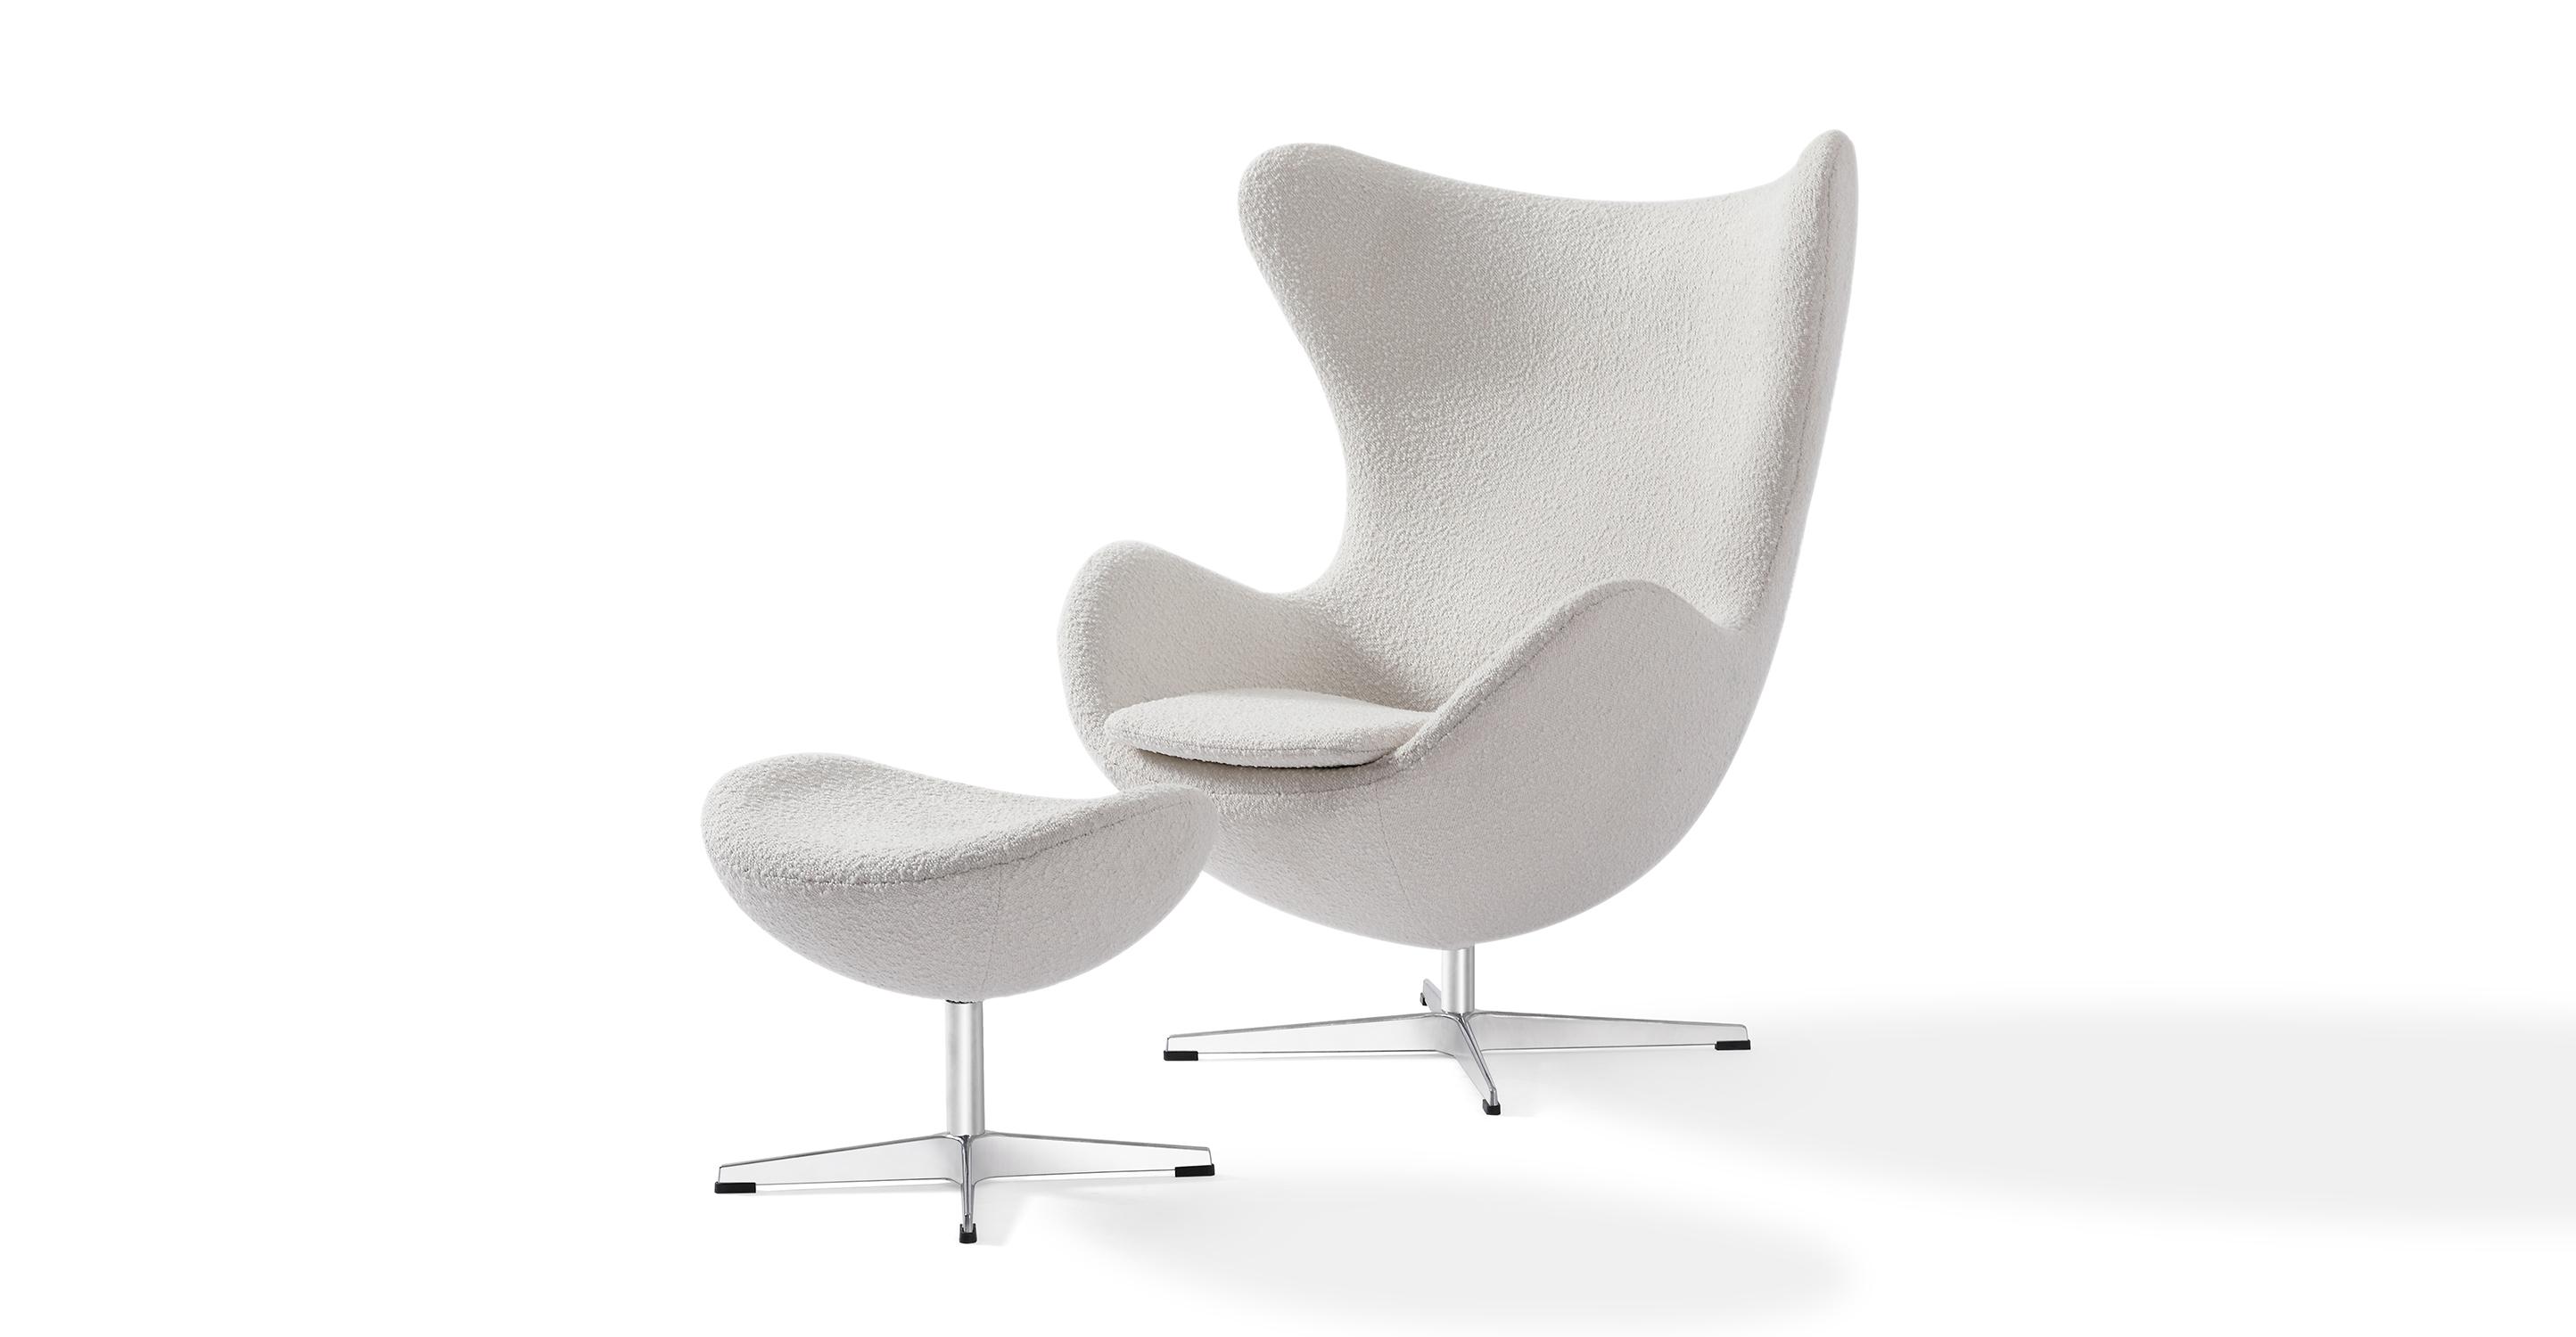 Amoeba Swivel Fabric Chair & Ottoman, Blanc Boucle